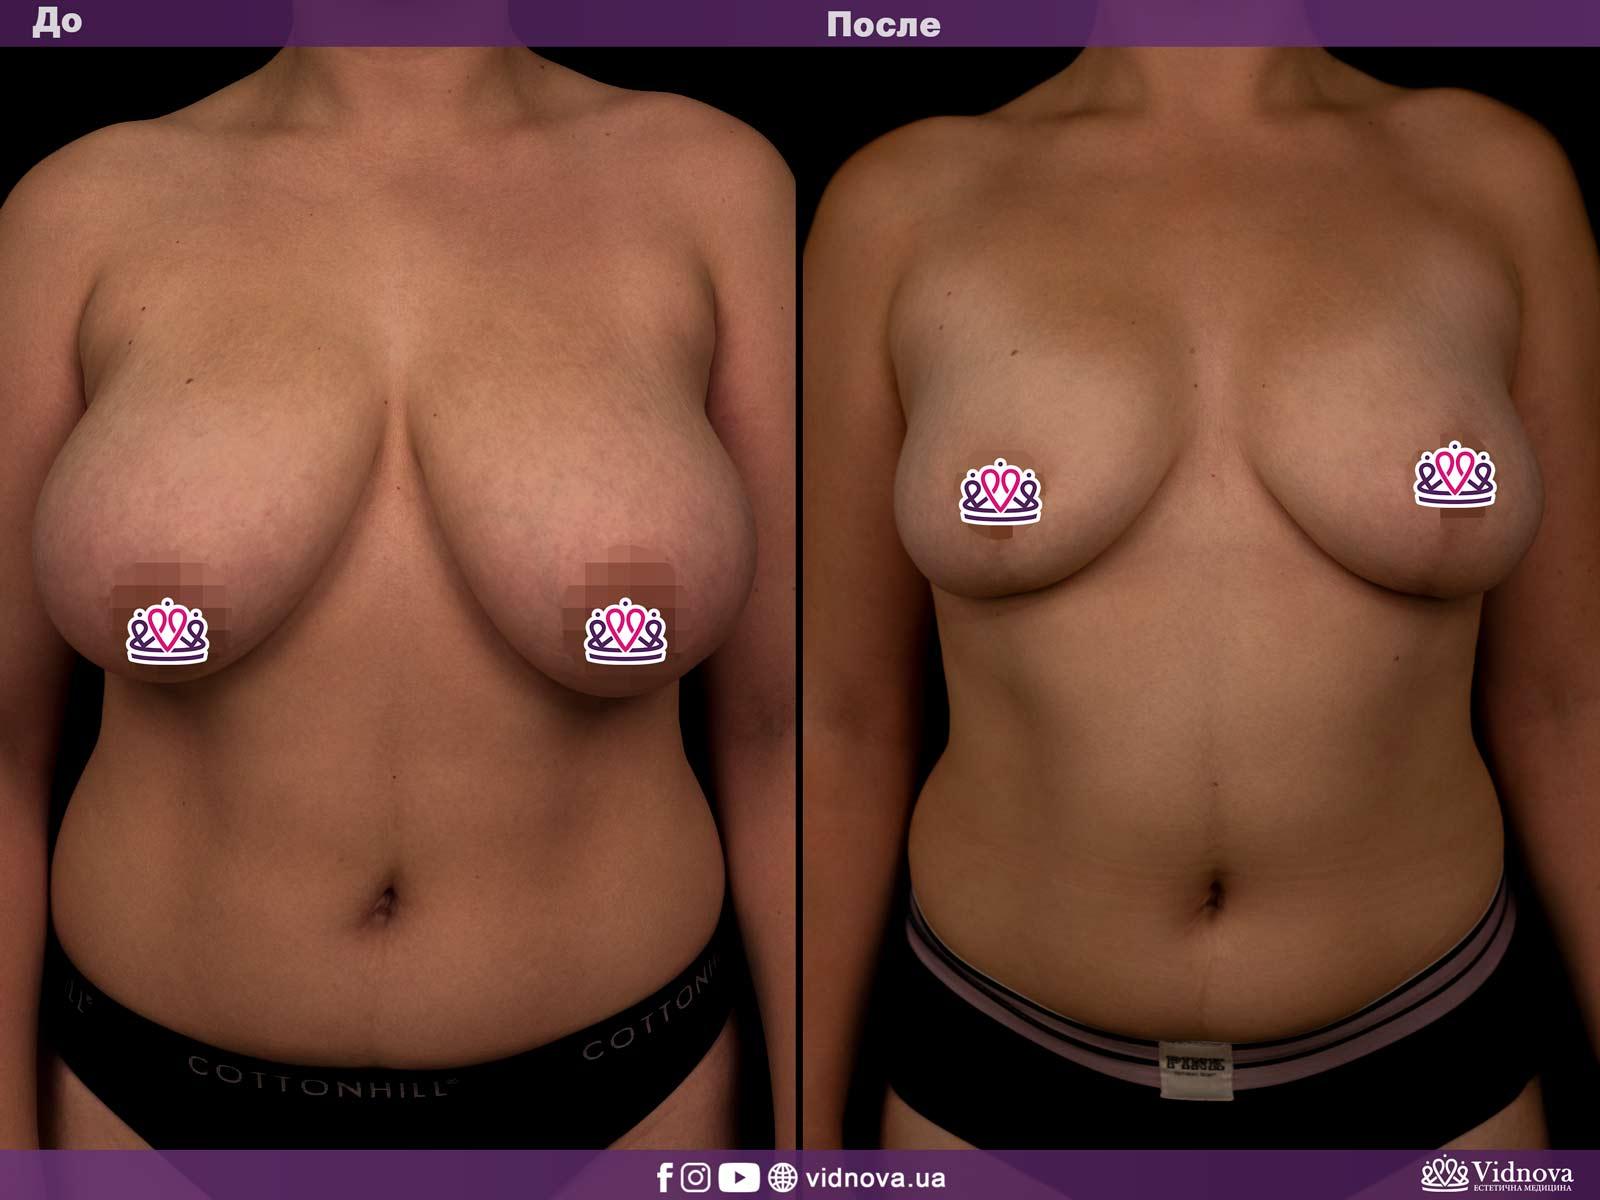 Уменьшение груди: Фото ДО и ПОСЛЕ - Пример №3-1 - Клиника Vidnova